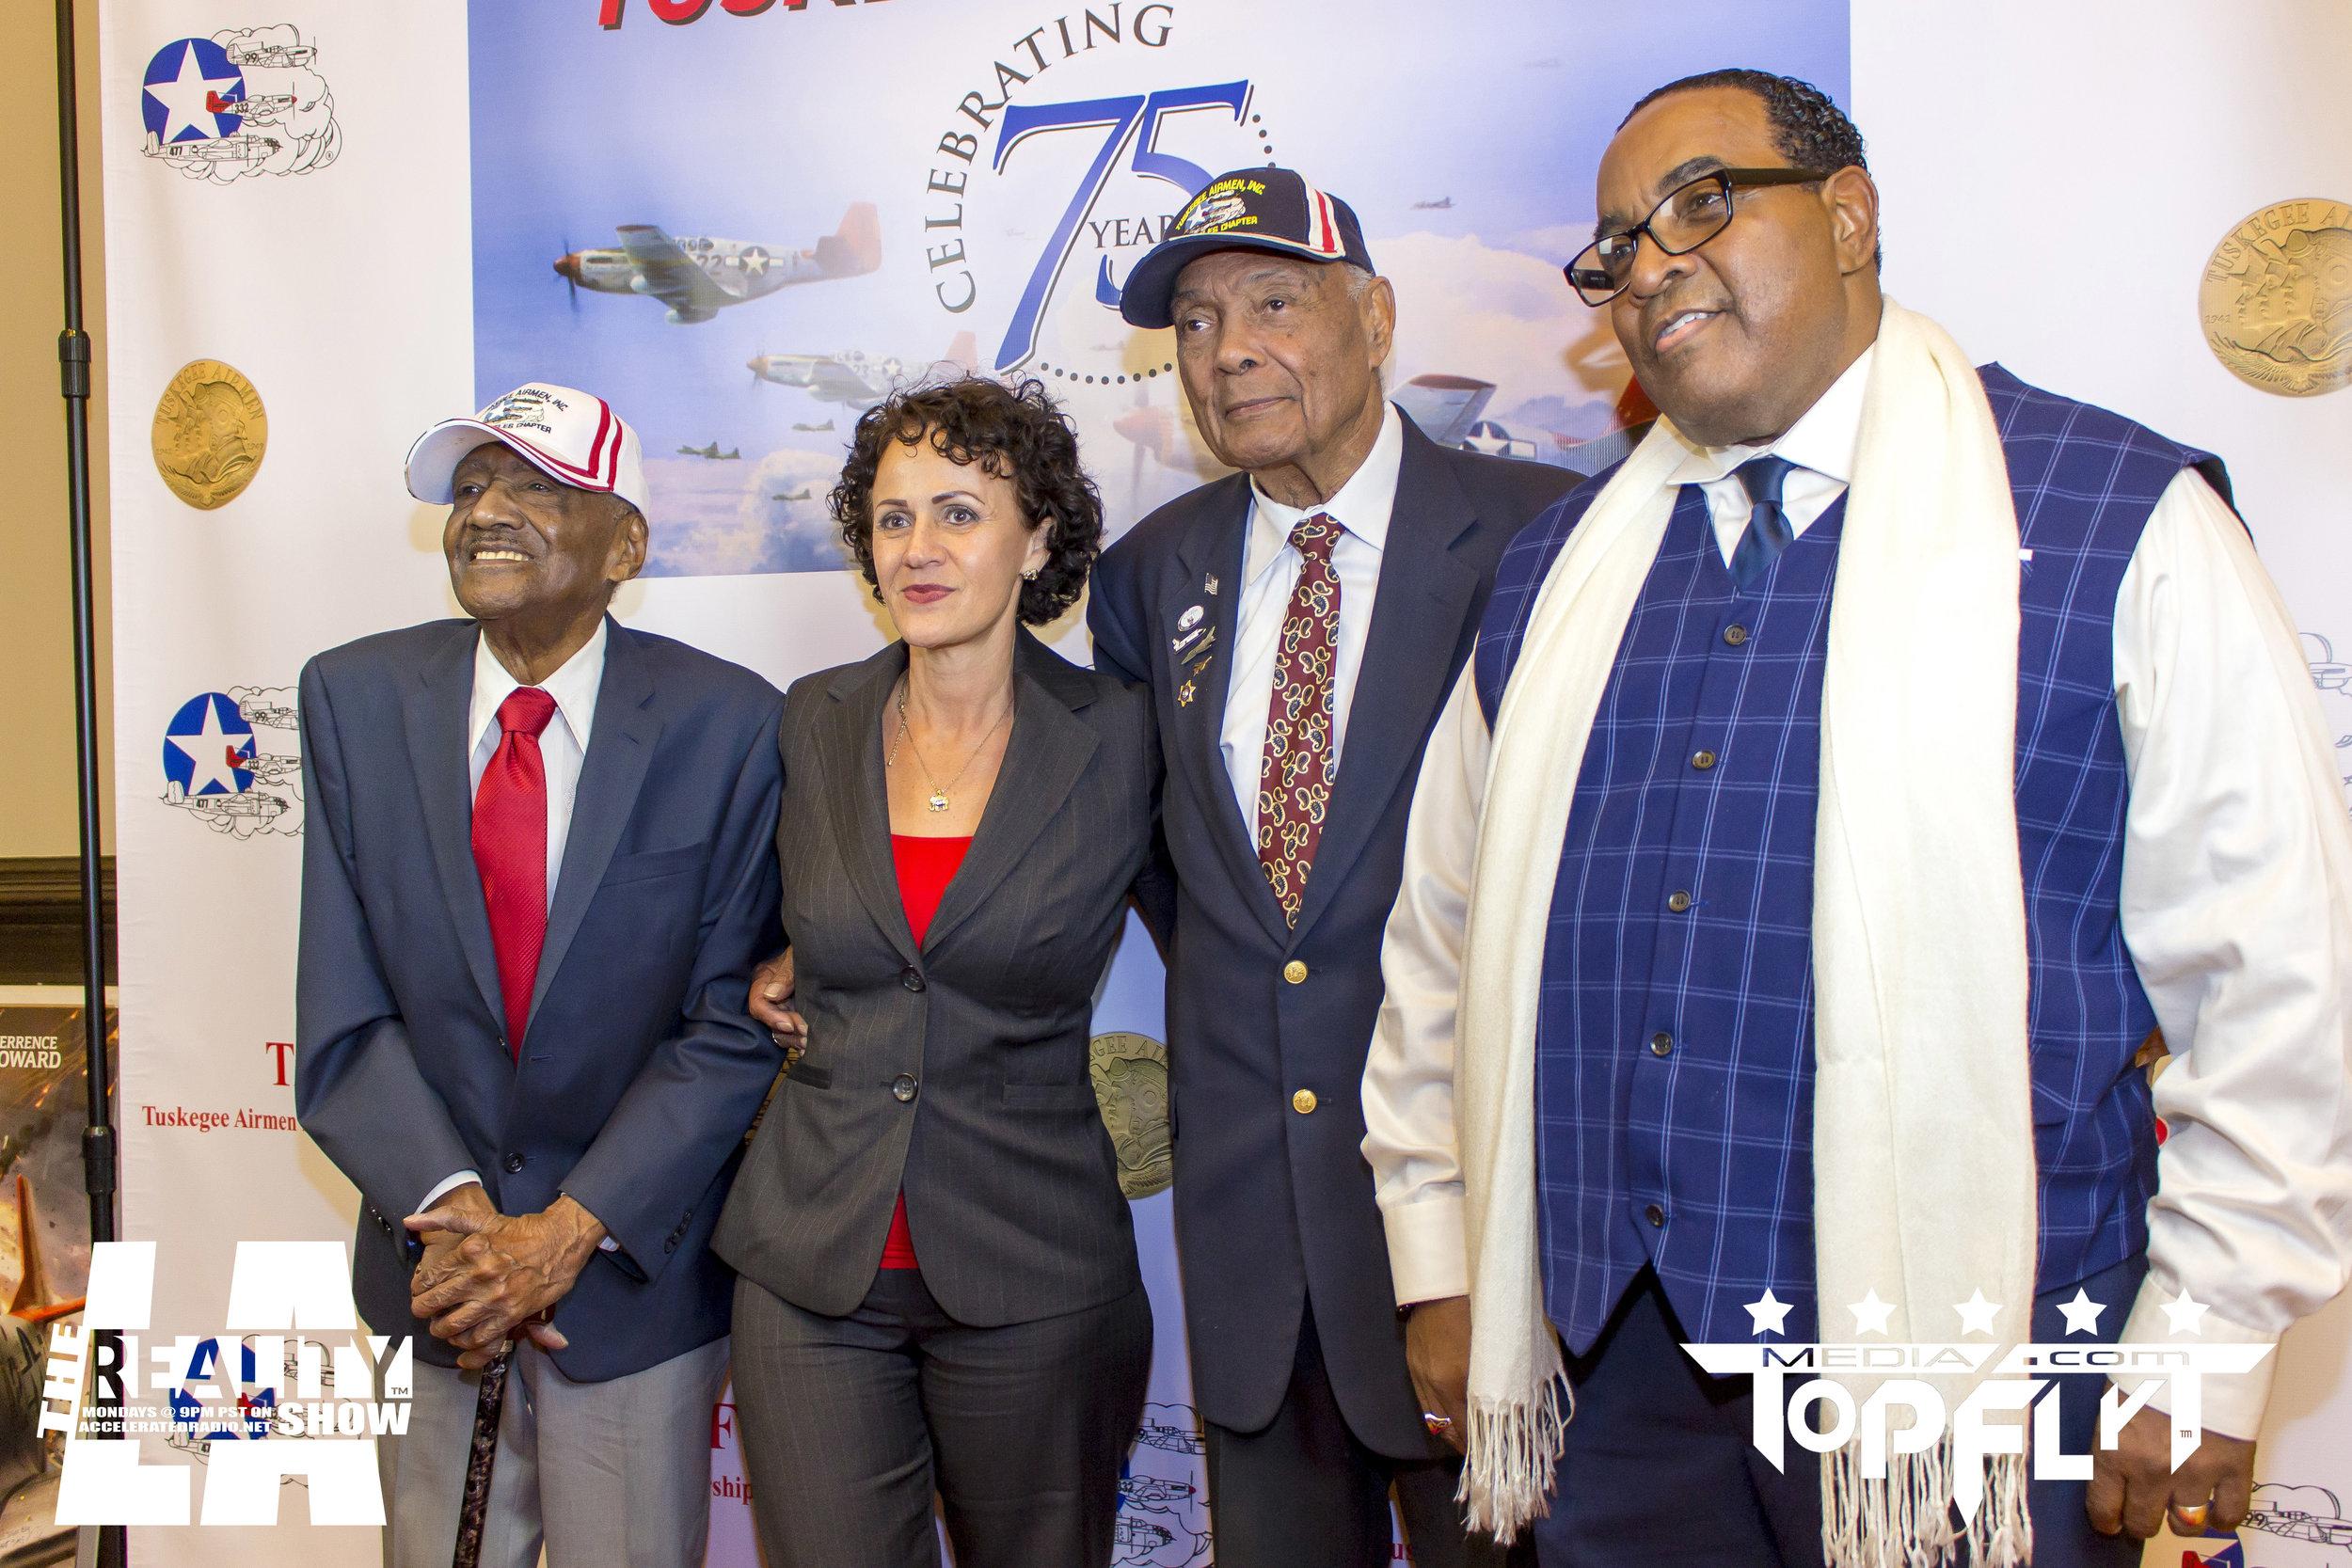 The Reality Show LA - Tuskegee Airmen 75th Anniversary VIP Reception_29.jpg